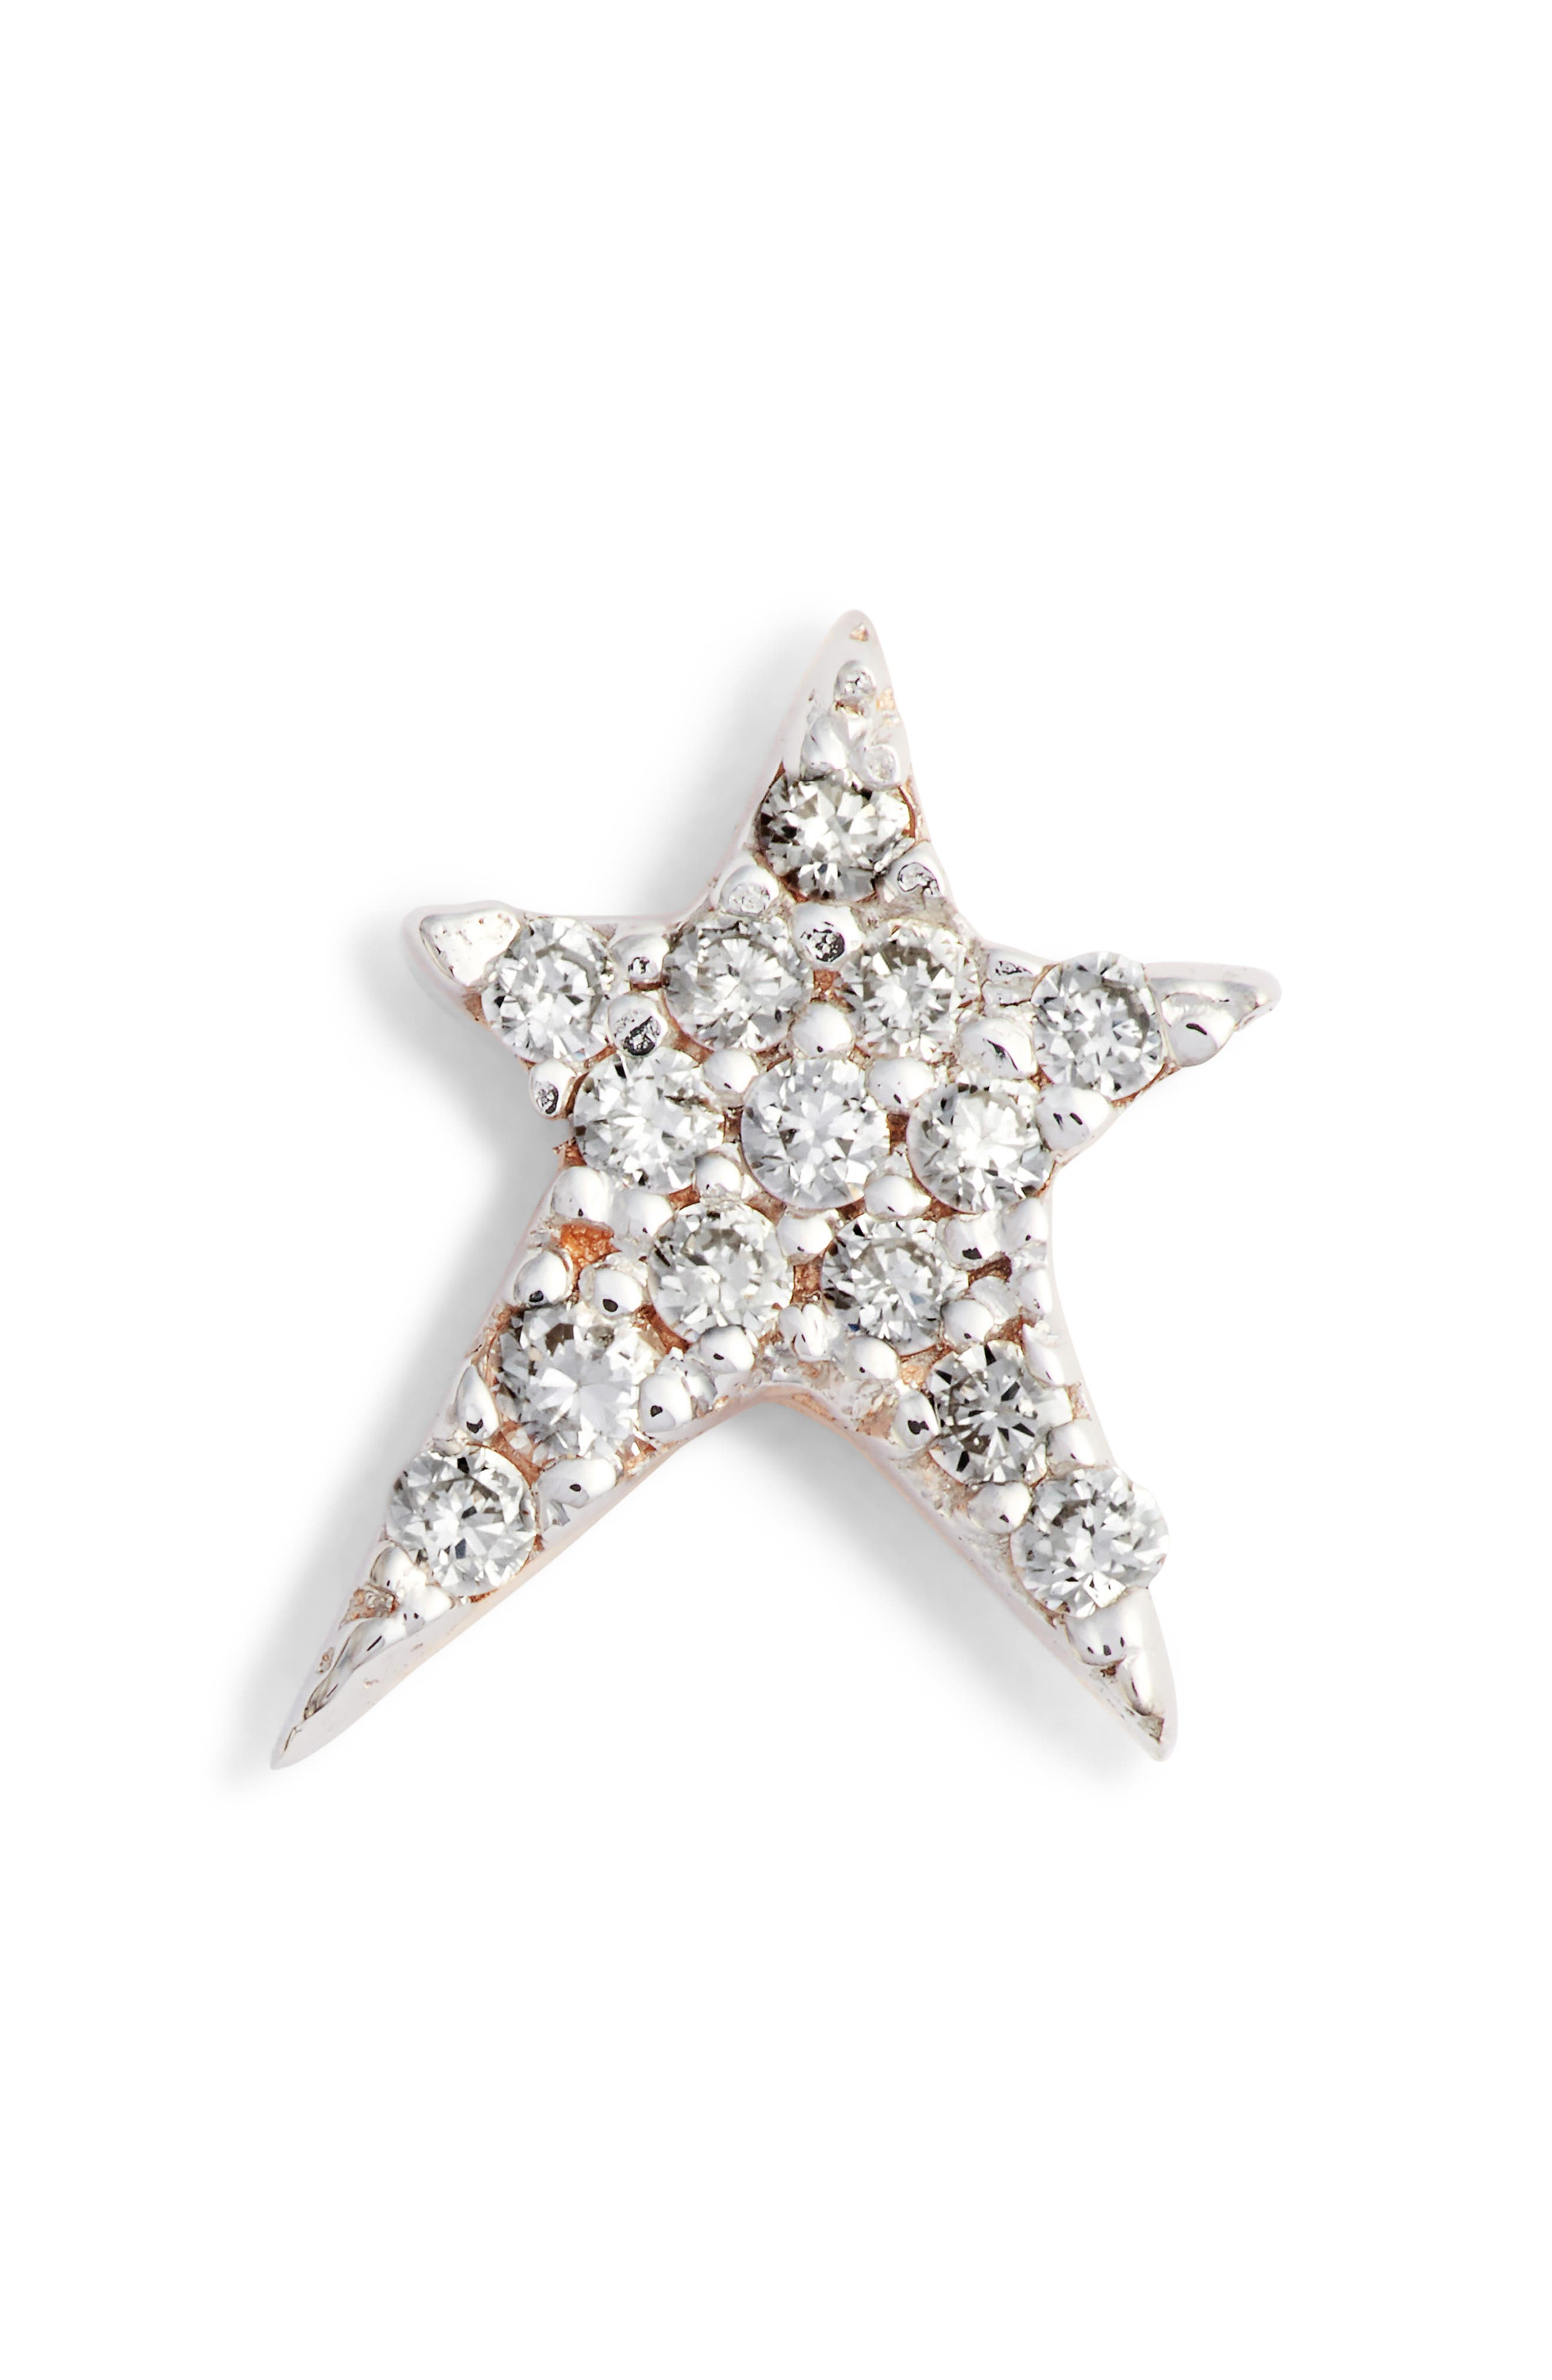 KISMET BY MILKA Struck Diamond Stud Earring, Main, color, 712